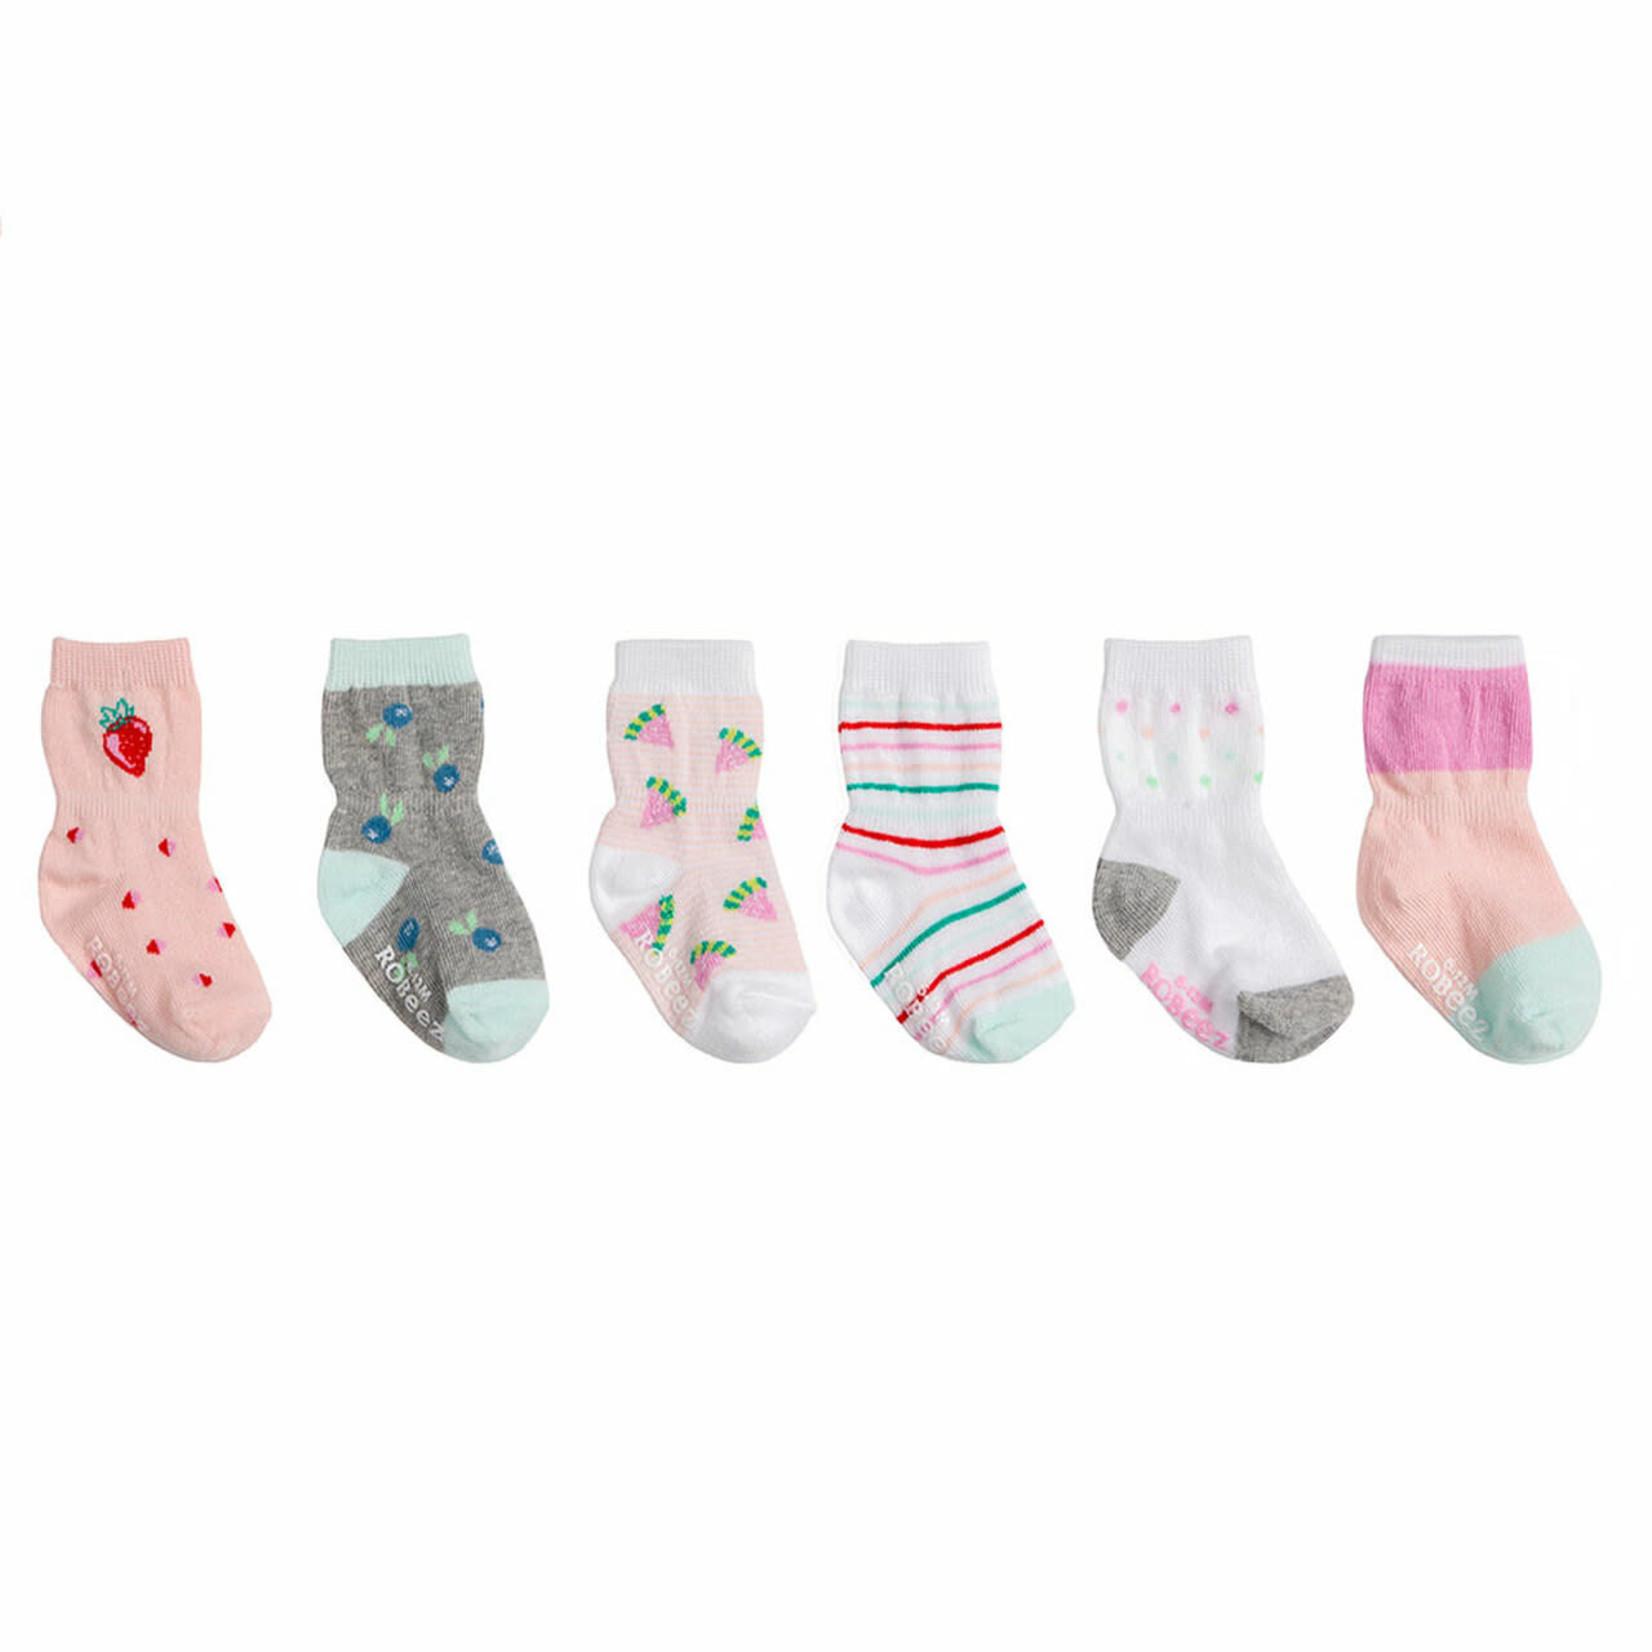 Robeez 6 Pk Socks, Fruity